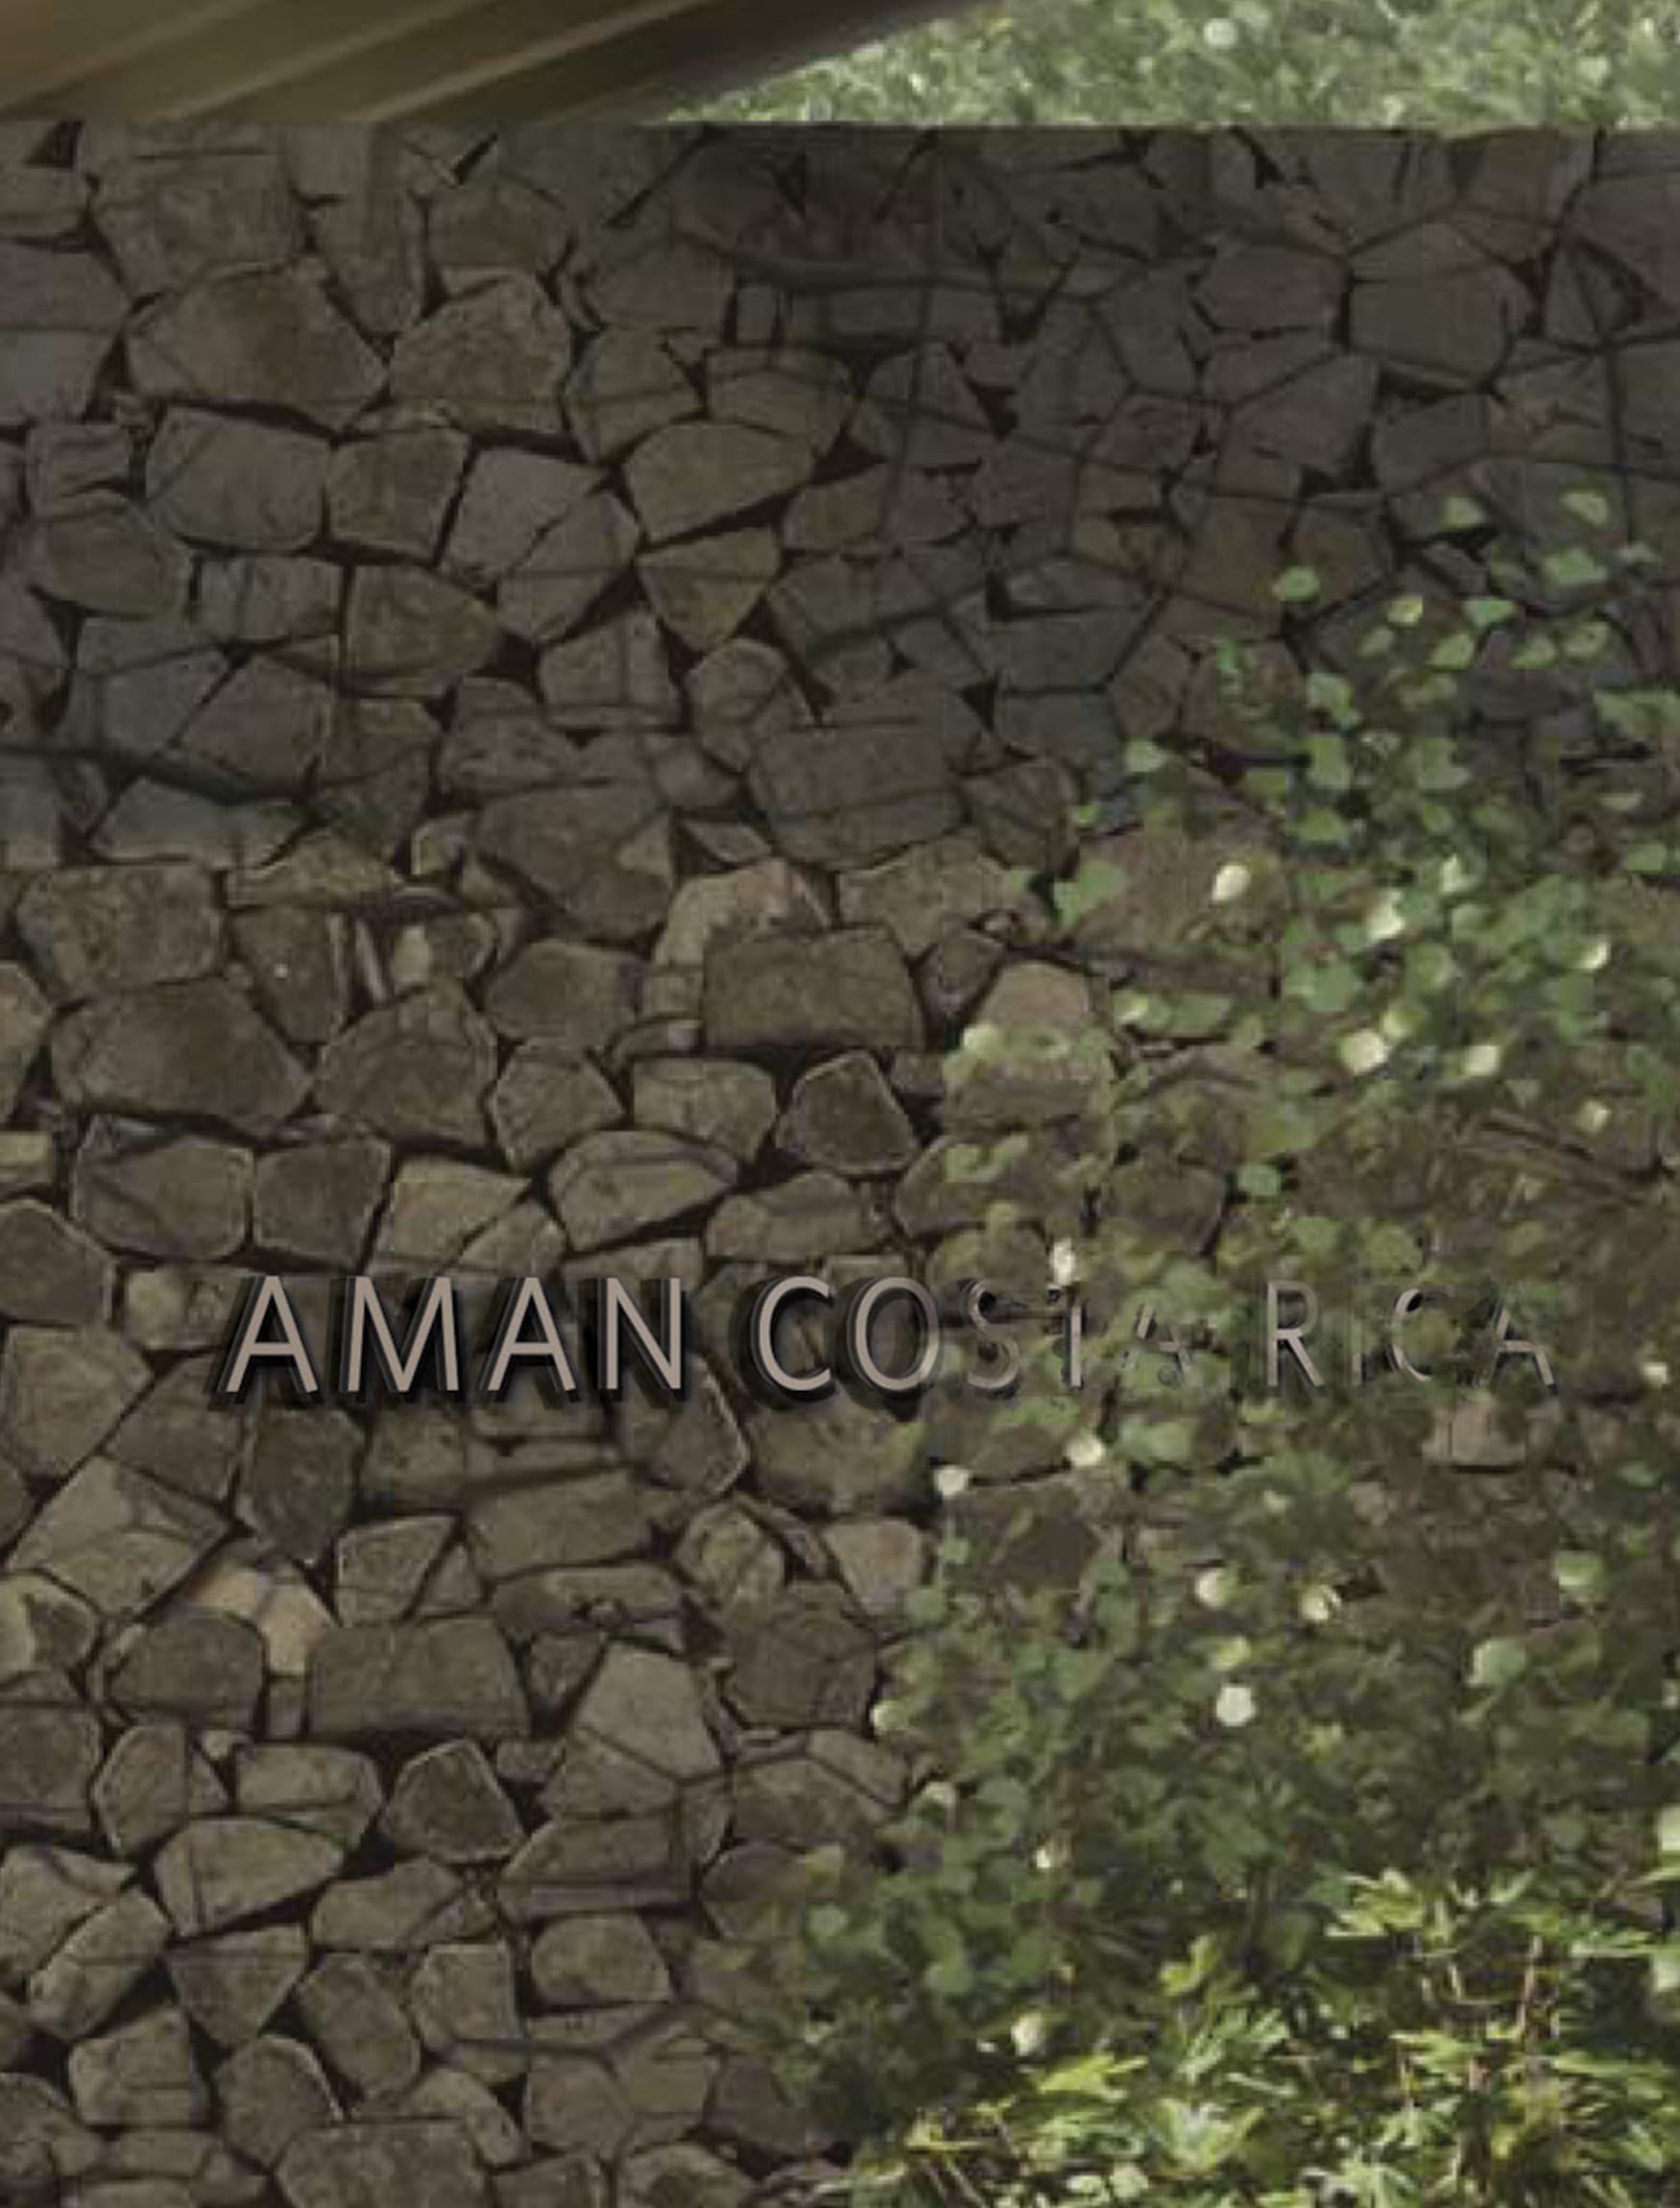 Aman Resort in Costa Rica, Hospitality Design, Entry Gateway Project Identity